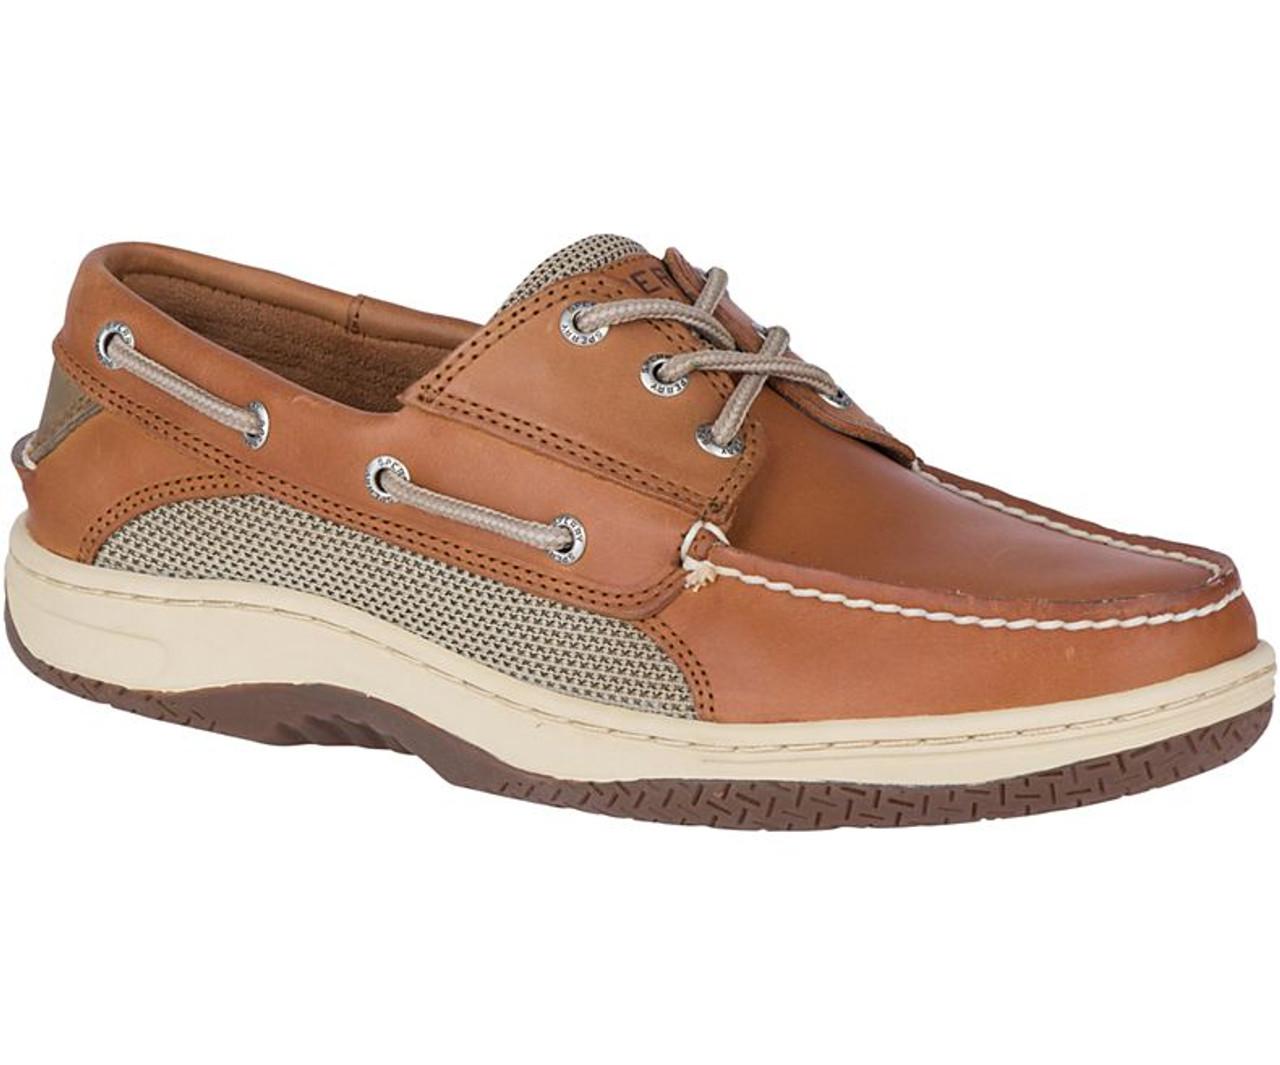 Billfish 3-Eye Boat Shoe 0799320 0799023